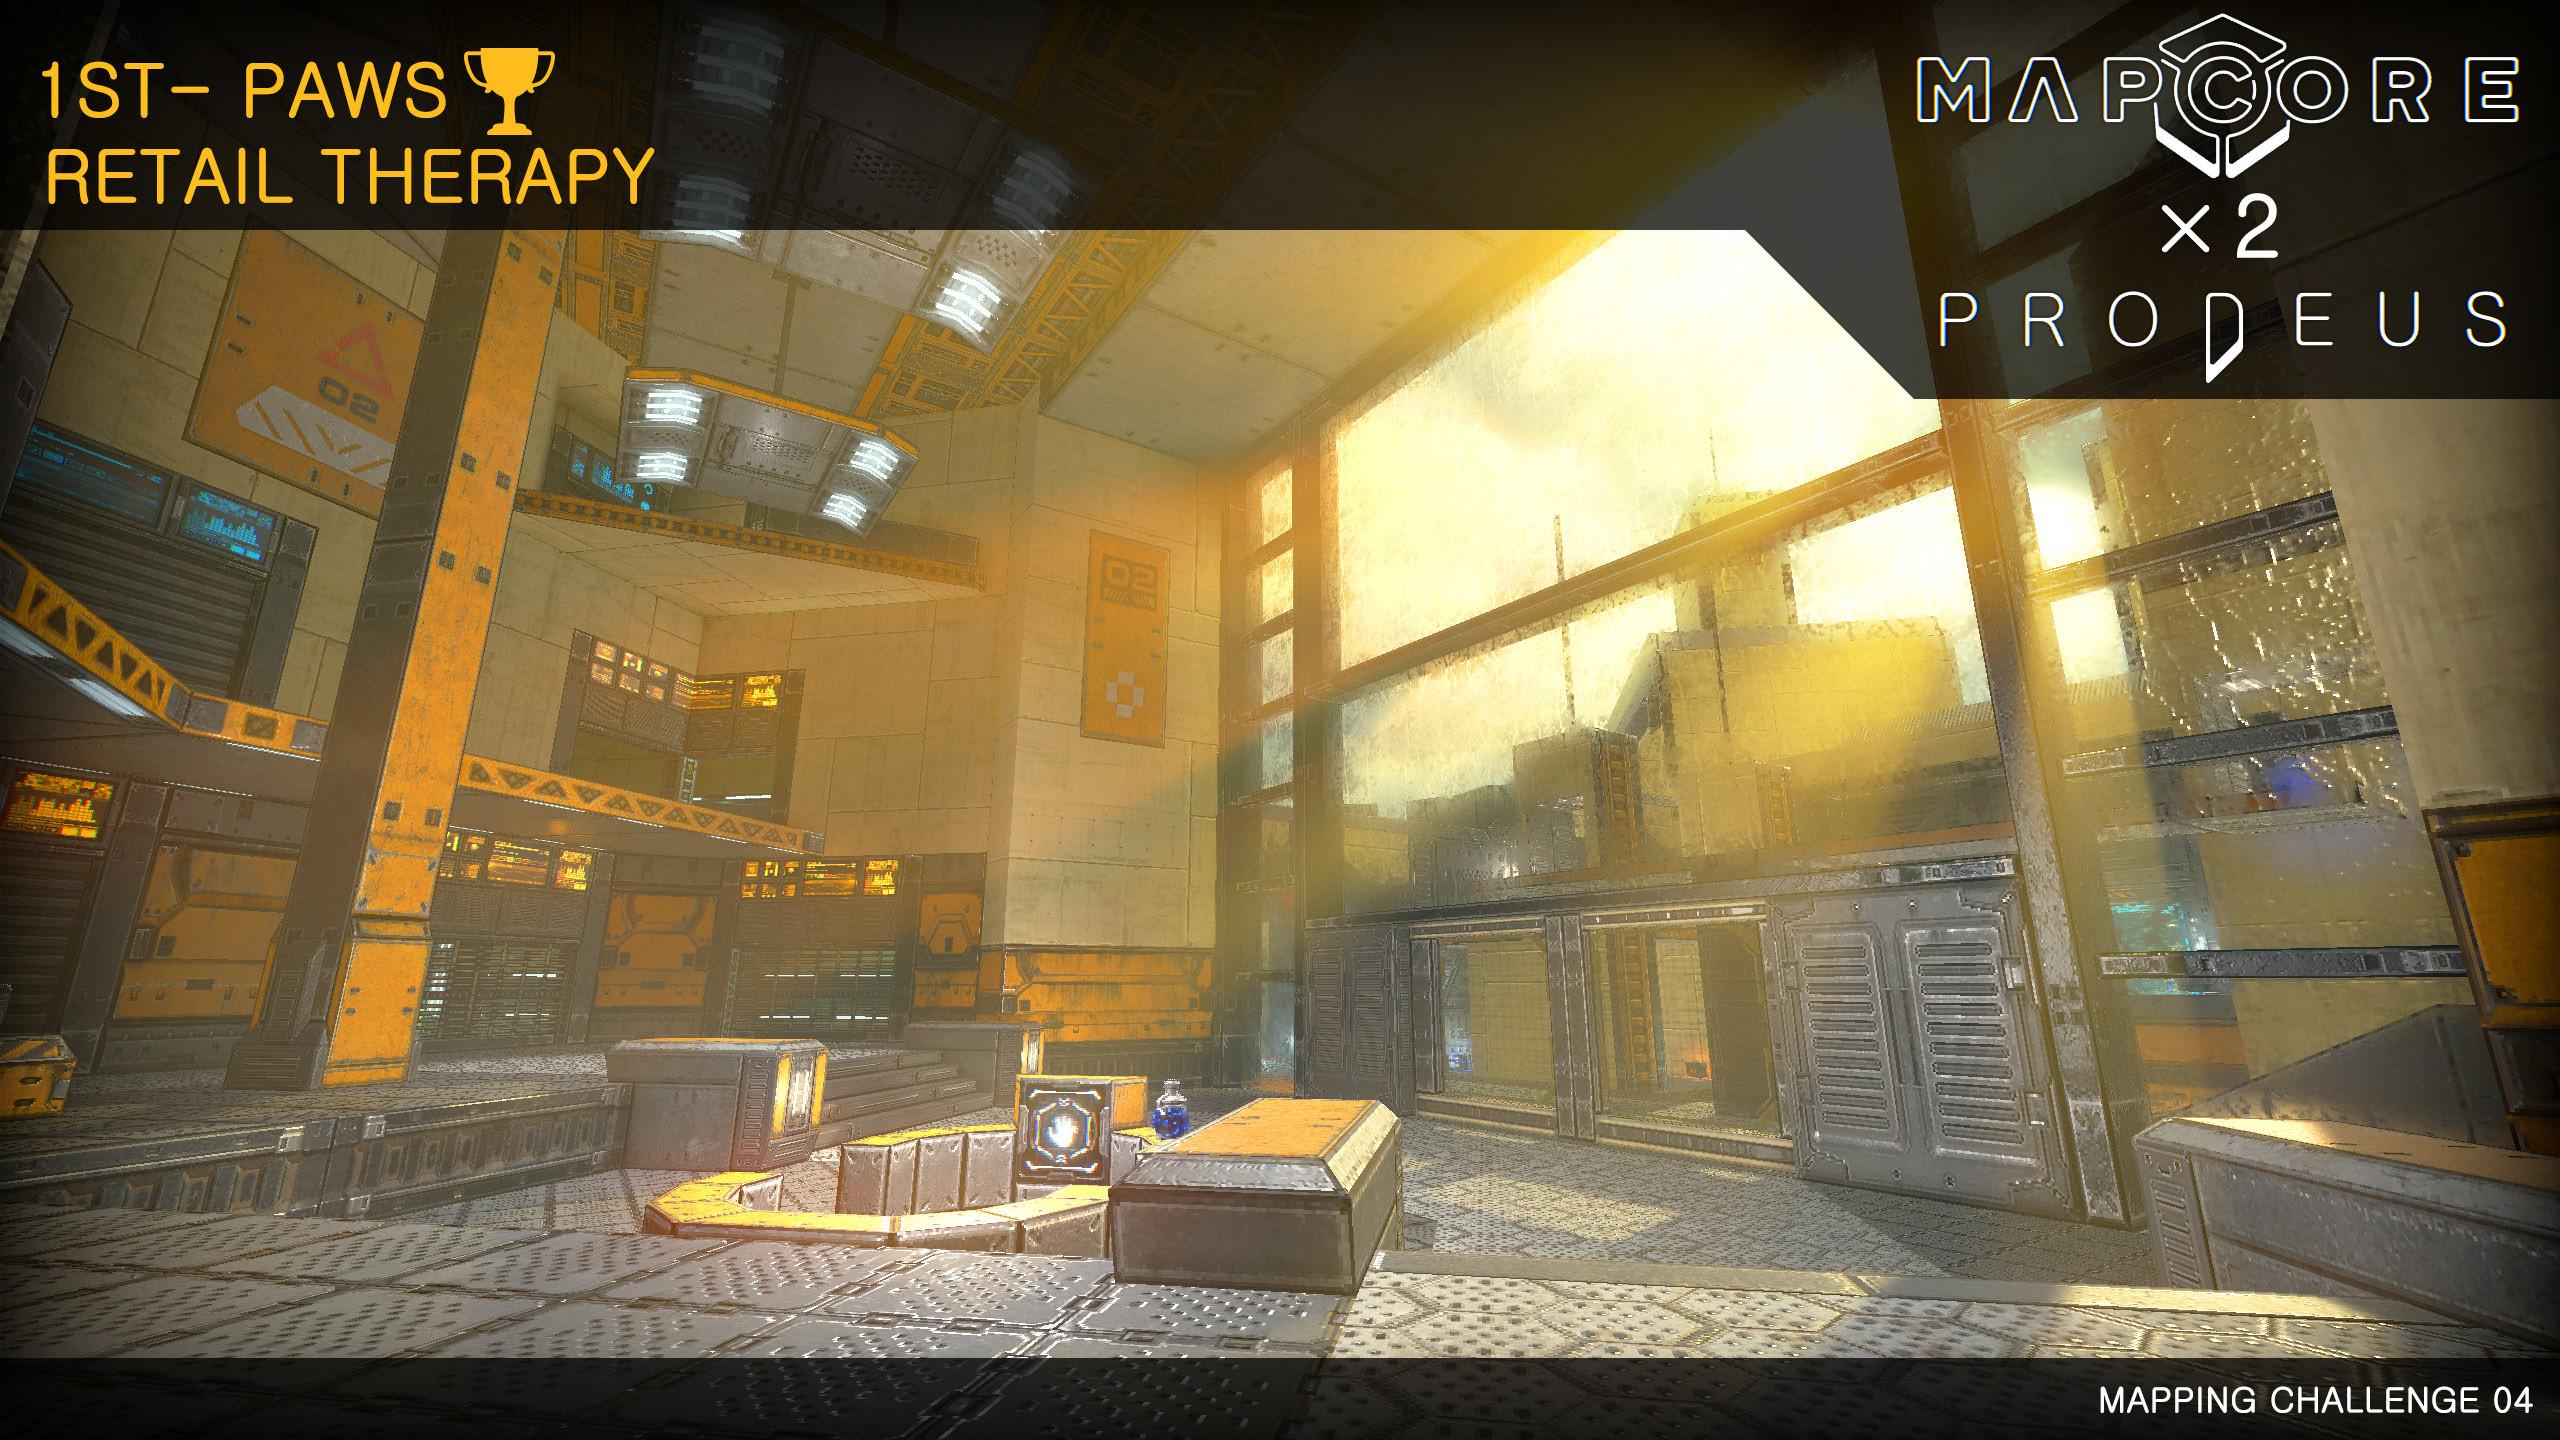 Mapcore X Prodeus Winners Announced!